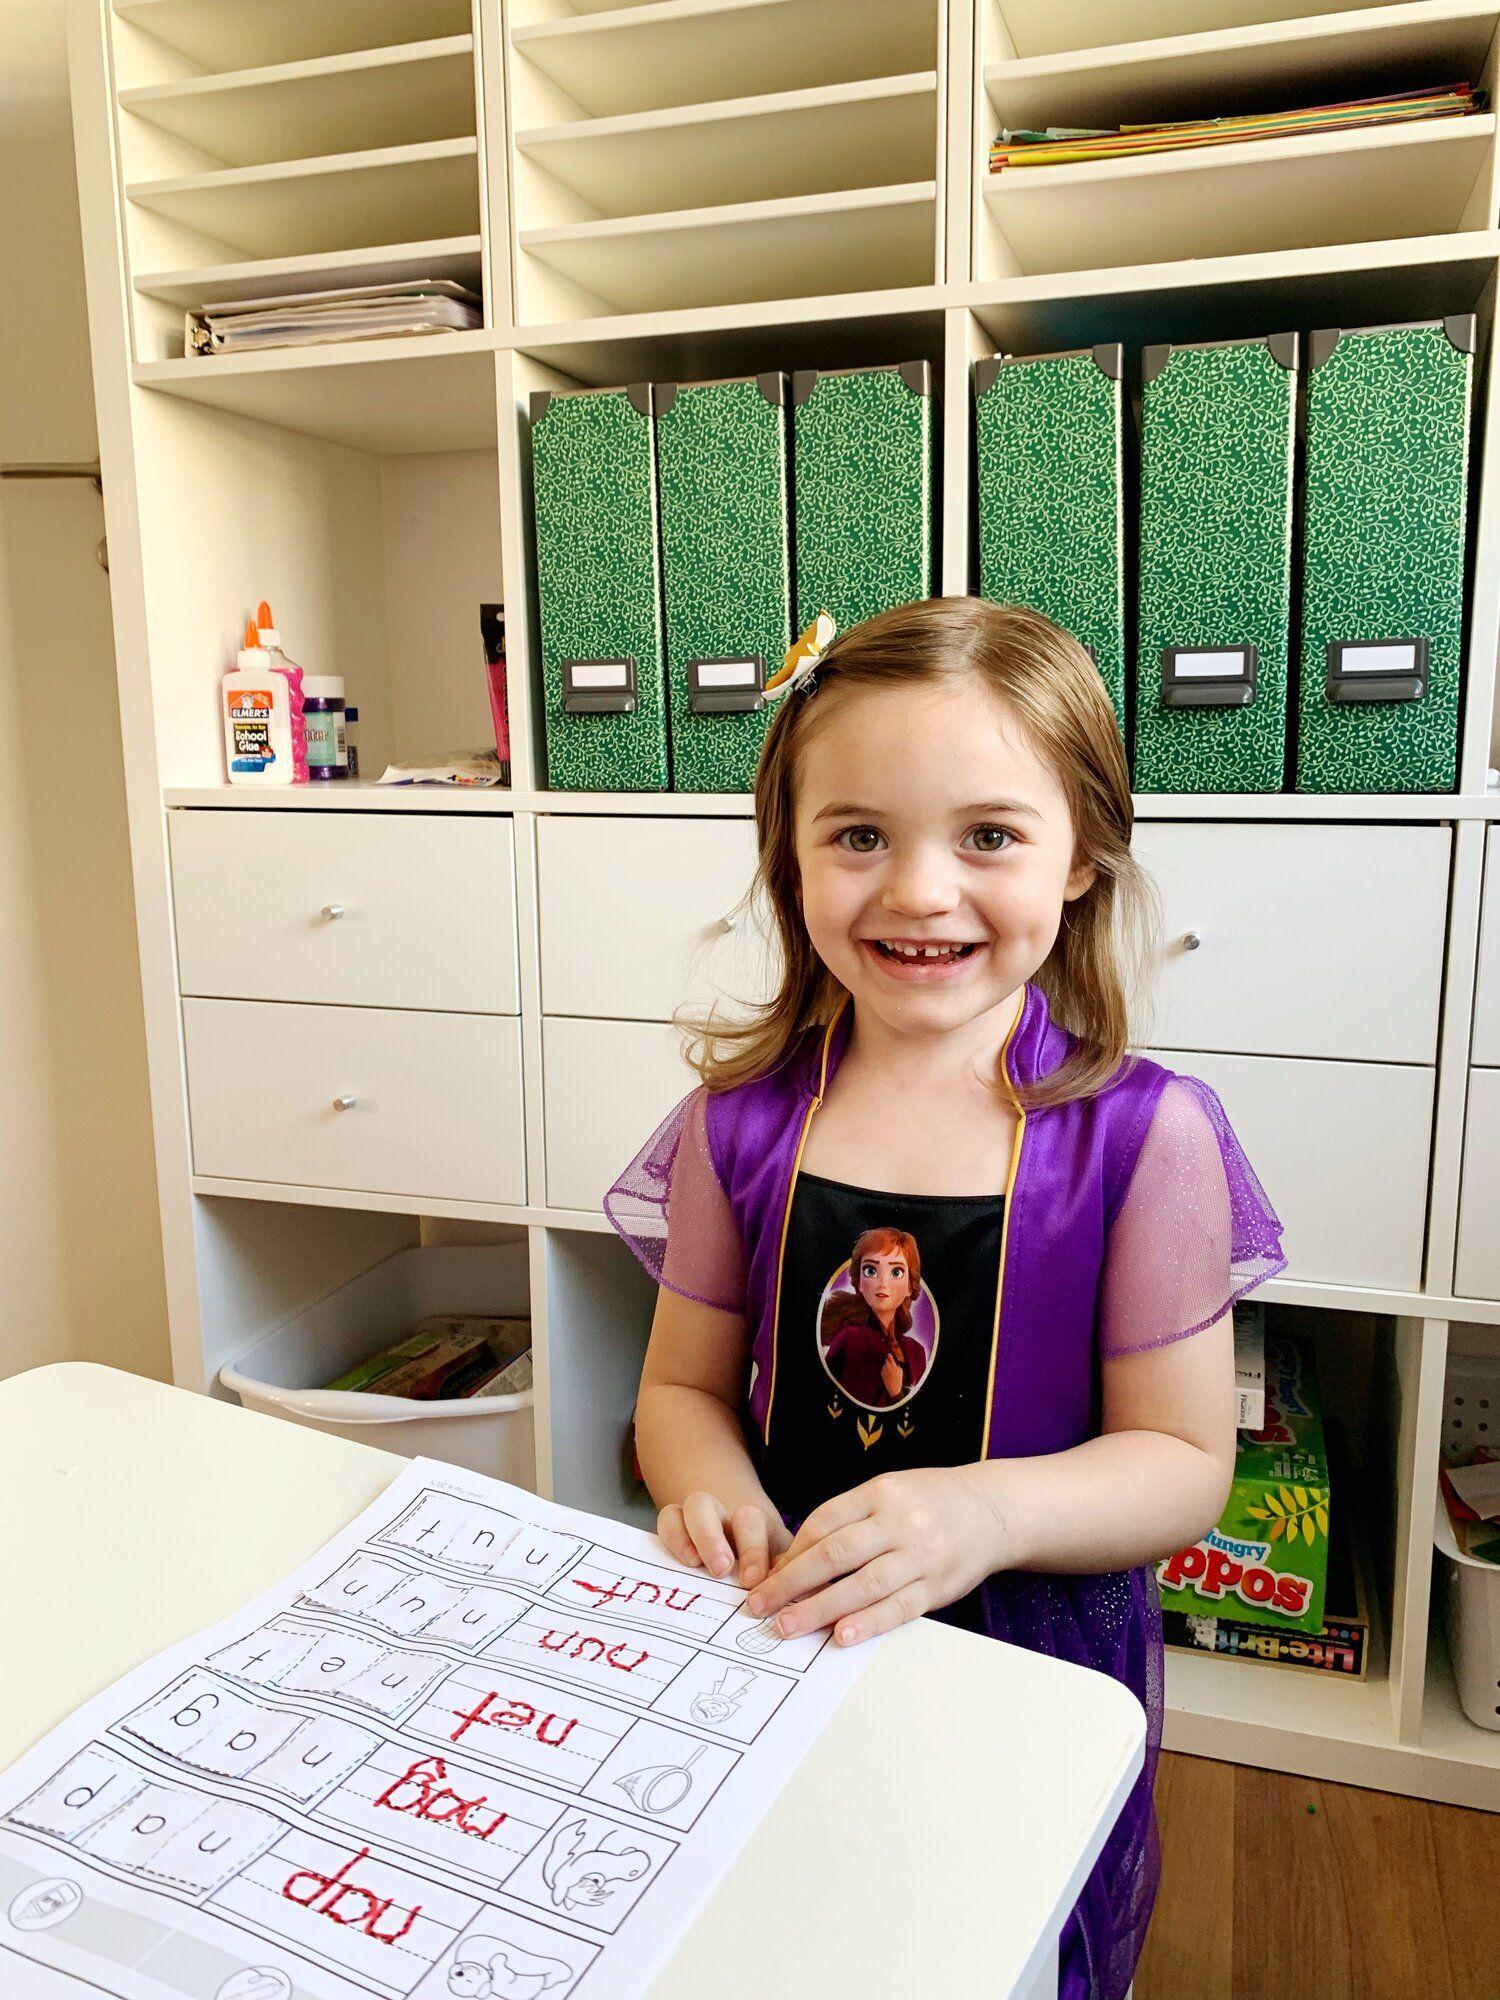 Free Homeschool Worksheets And Activities For A Preschool